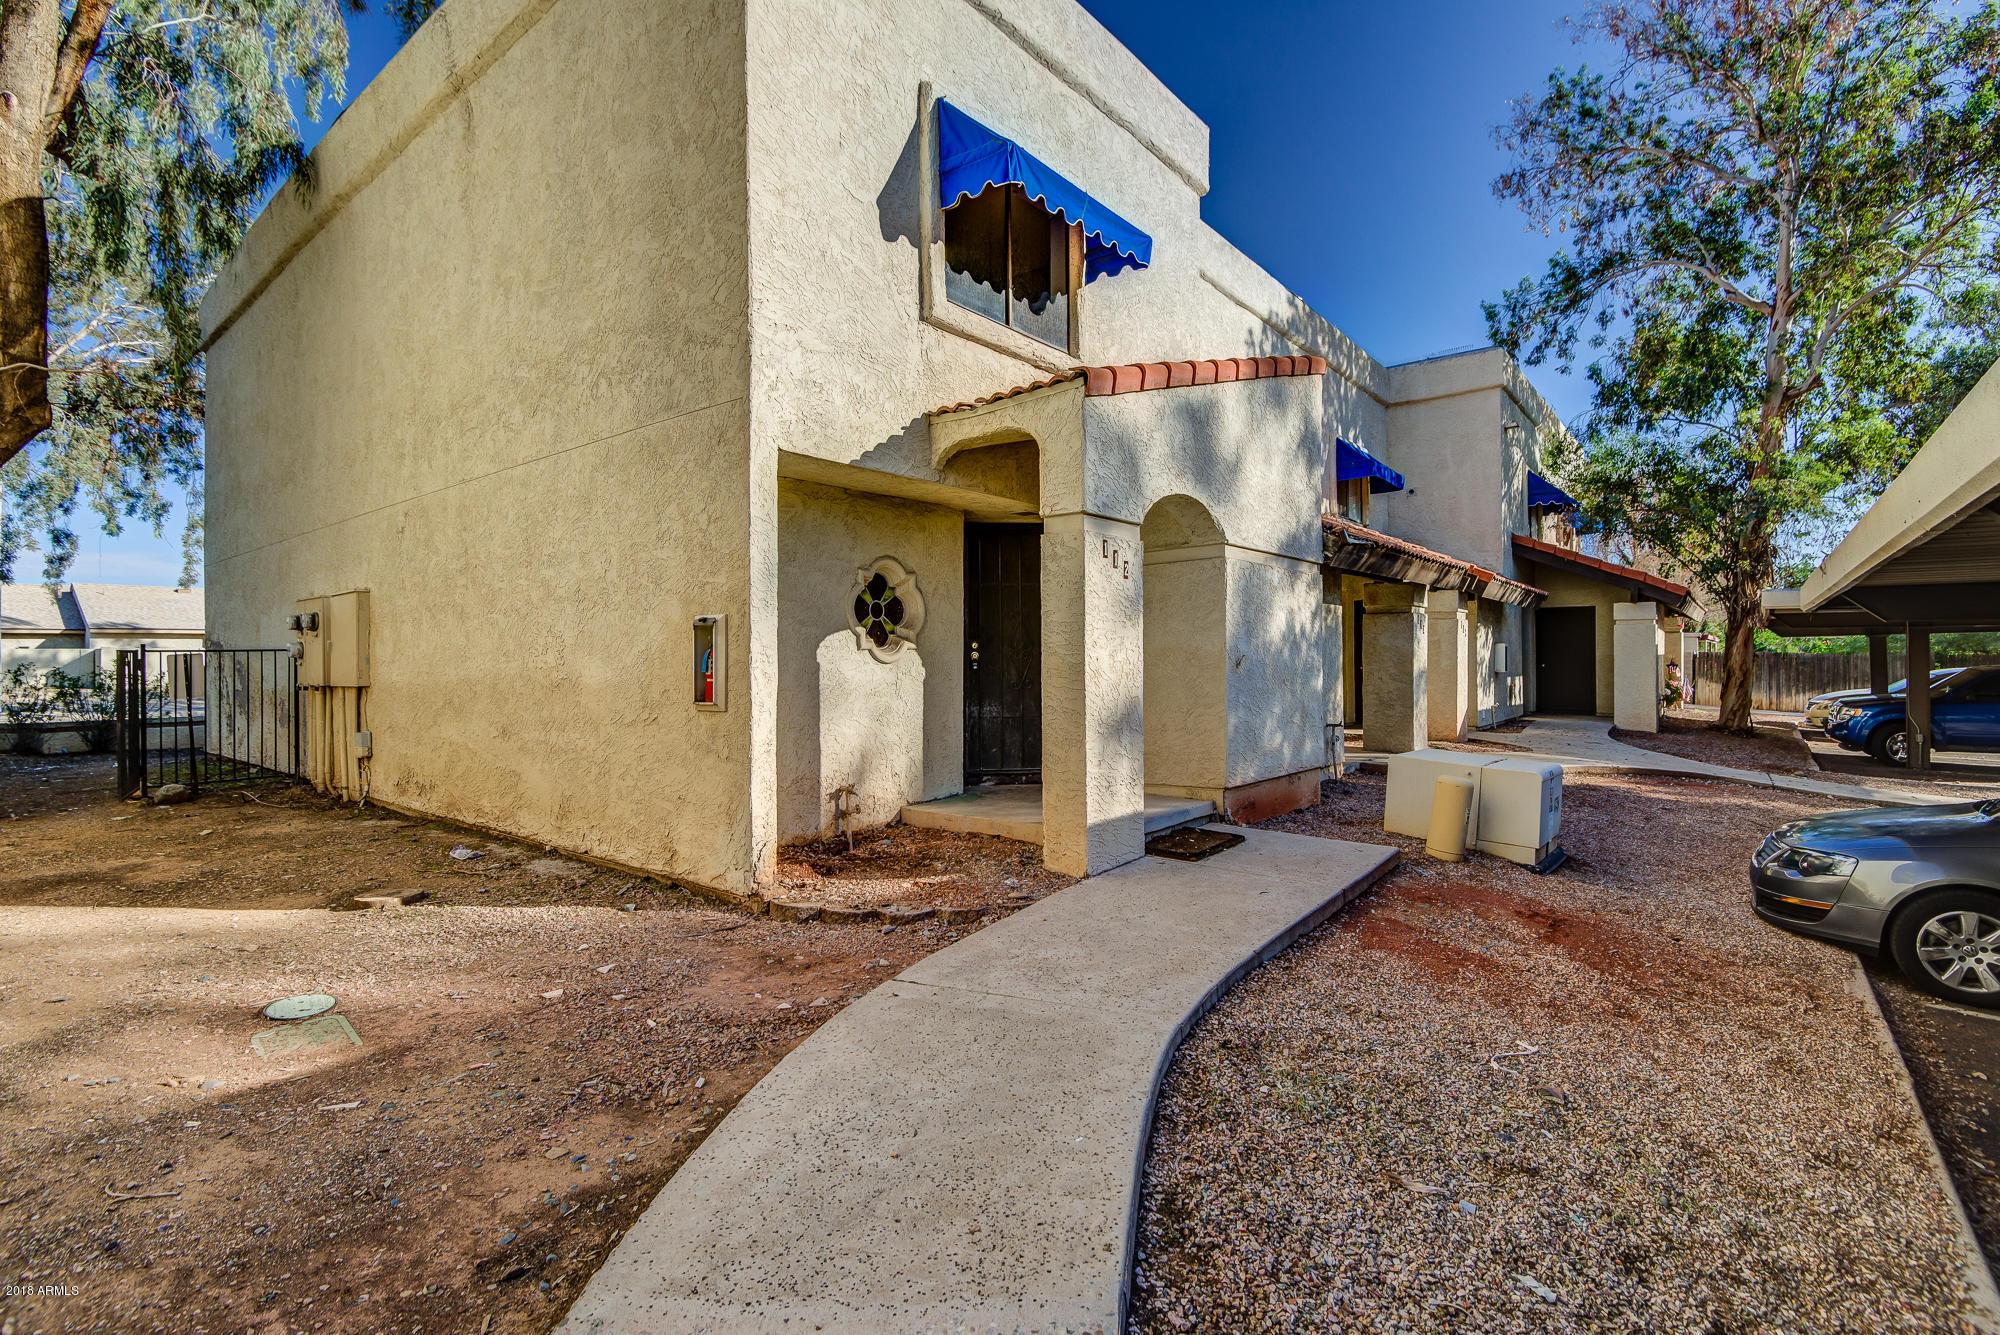 Photo of 2121 W UNION HILLS Drive #112, Phoenix, AZ 85027